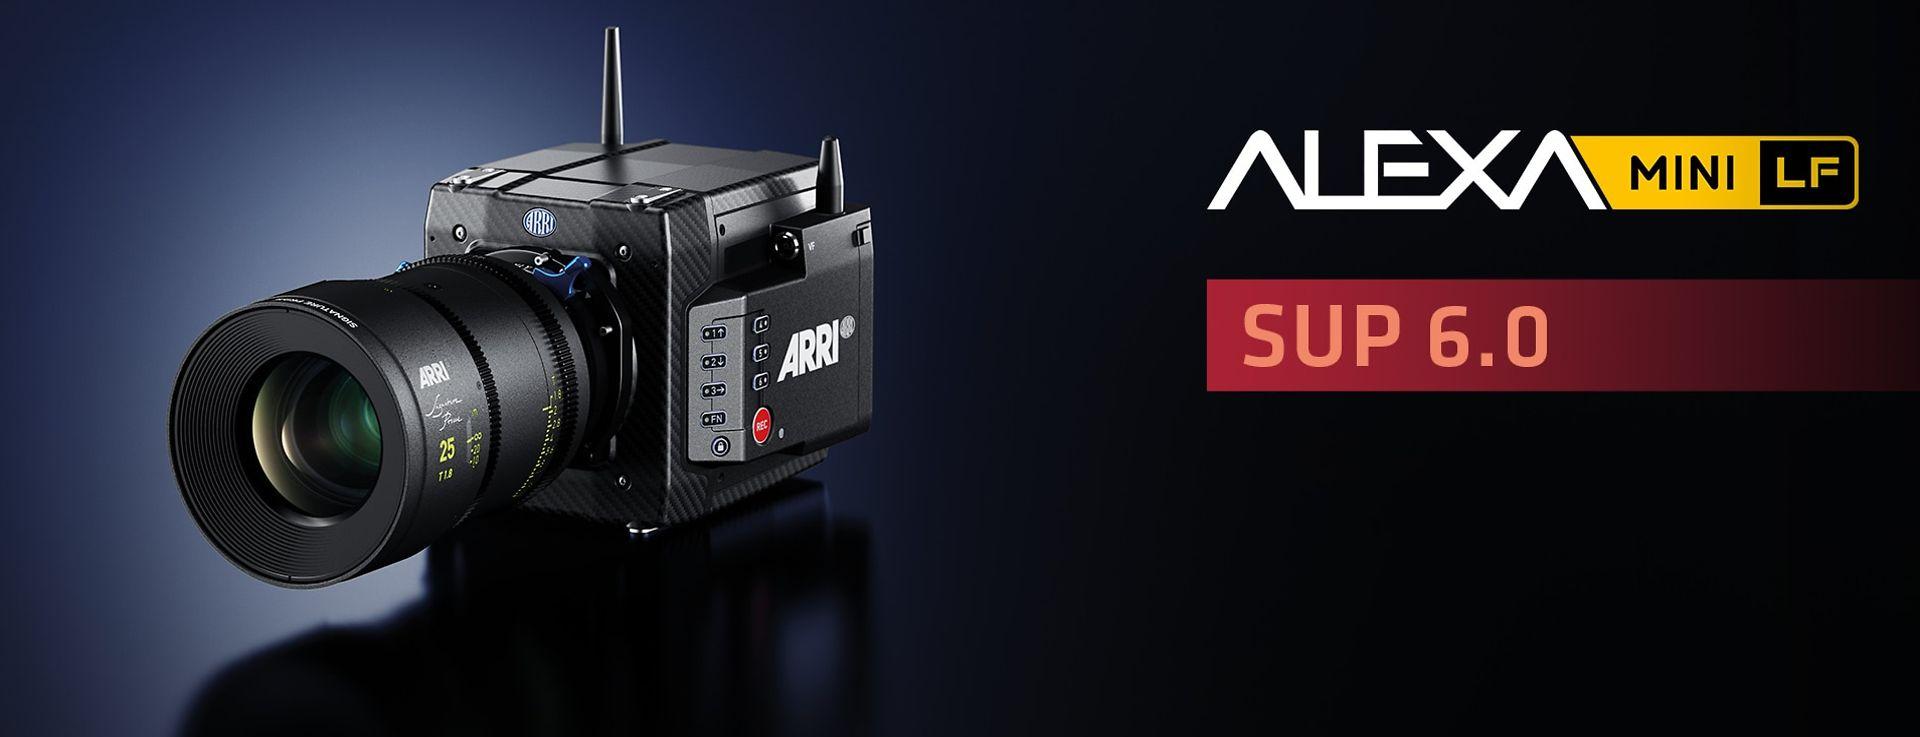 Nuevo Software para Alexa Mini LF